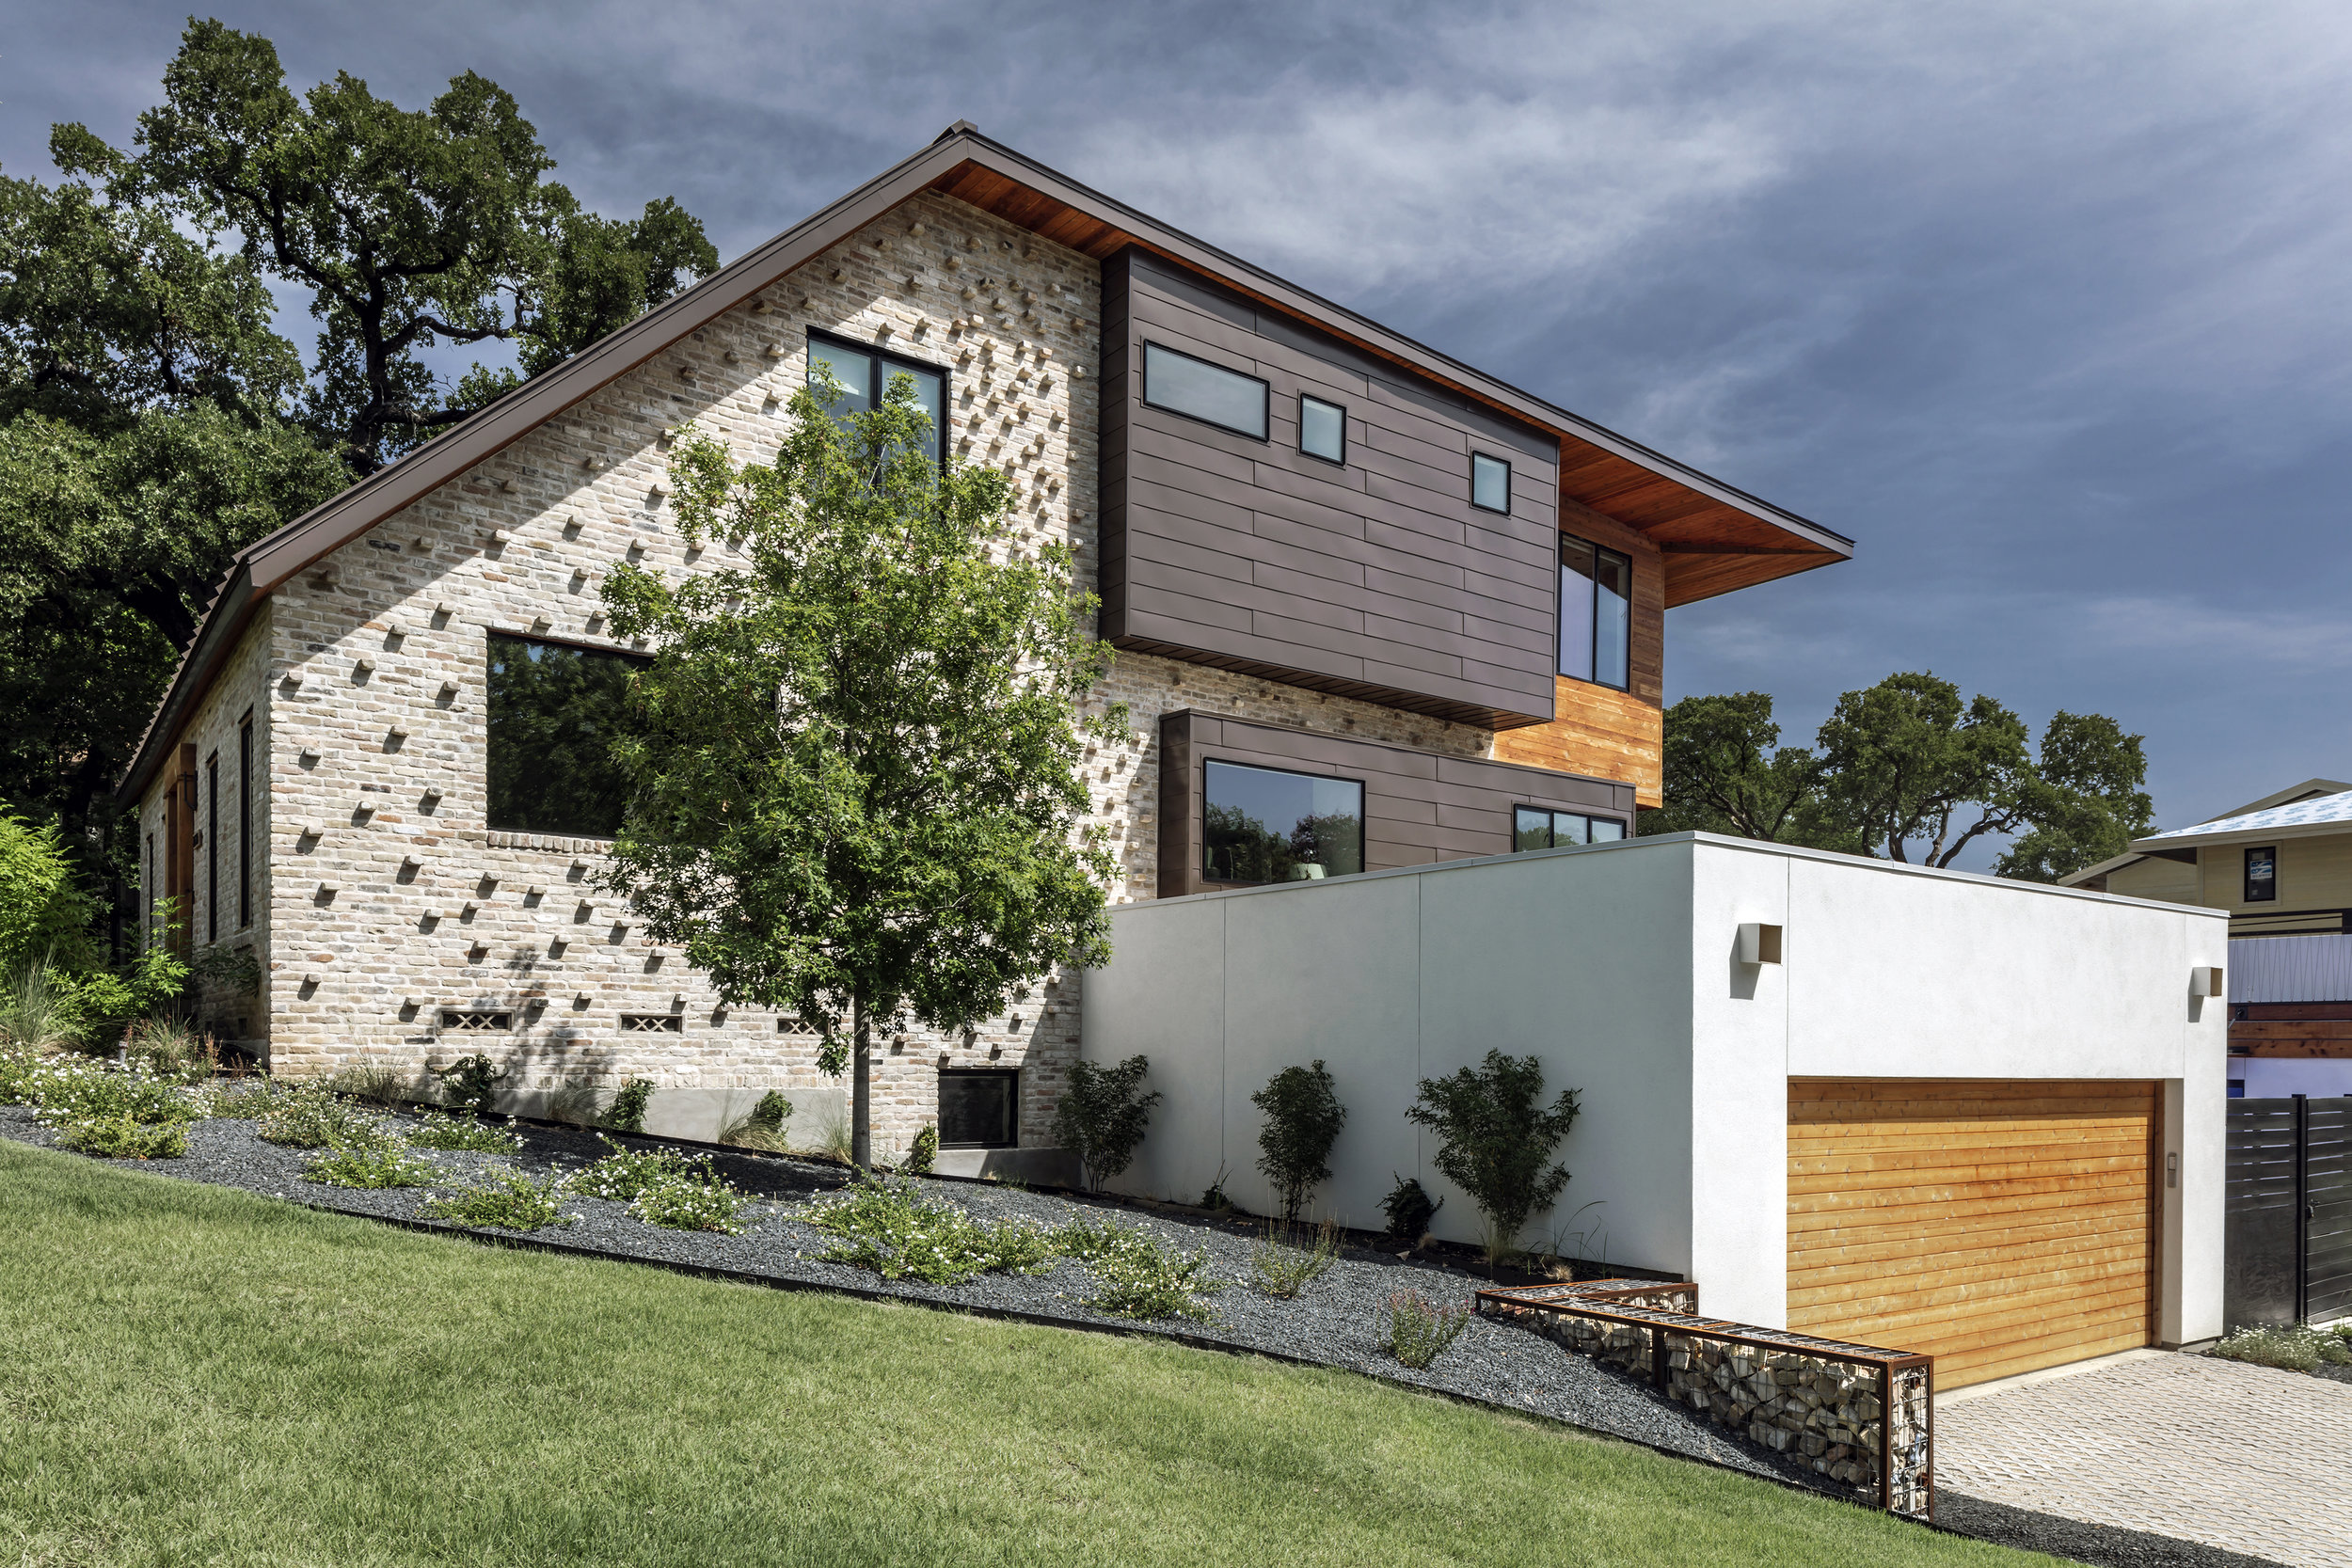 05 Mullet House by Matt Fajkus Architecture. Photo by Charles Davis Smith.jpg